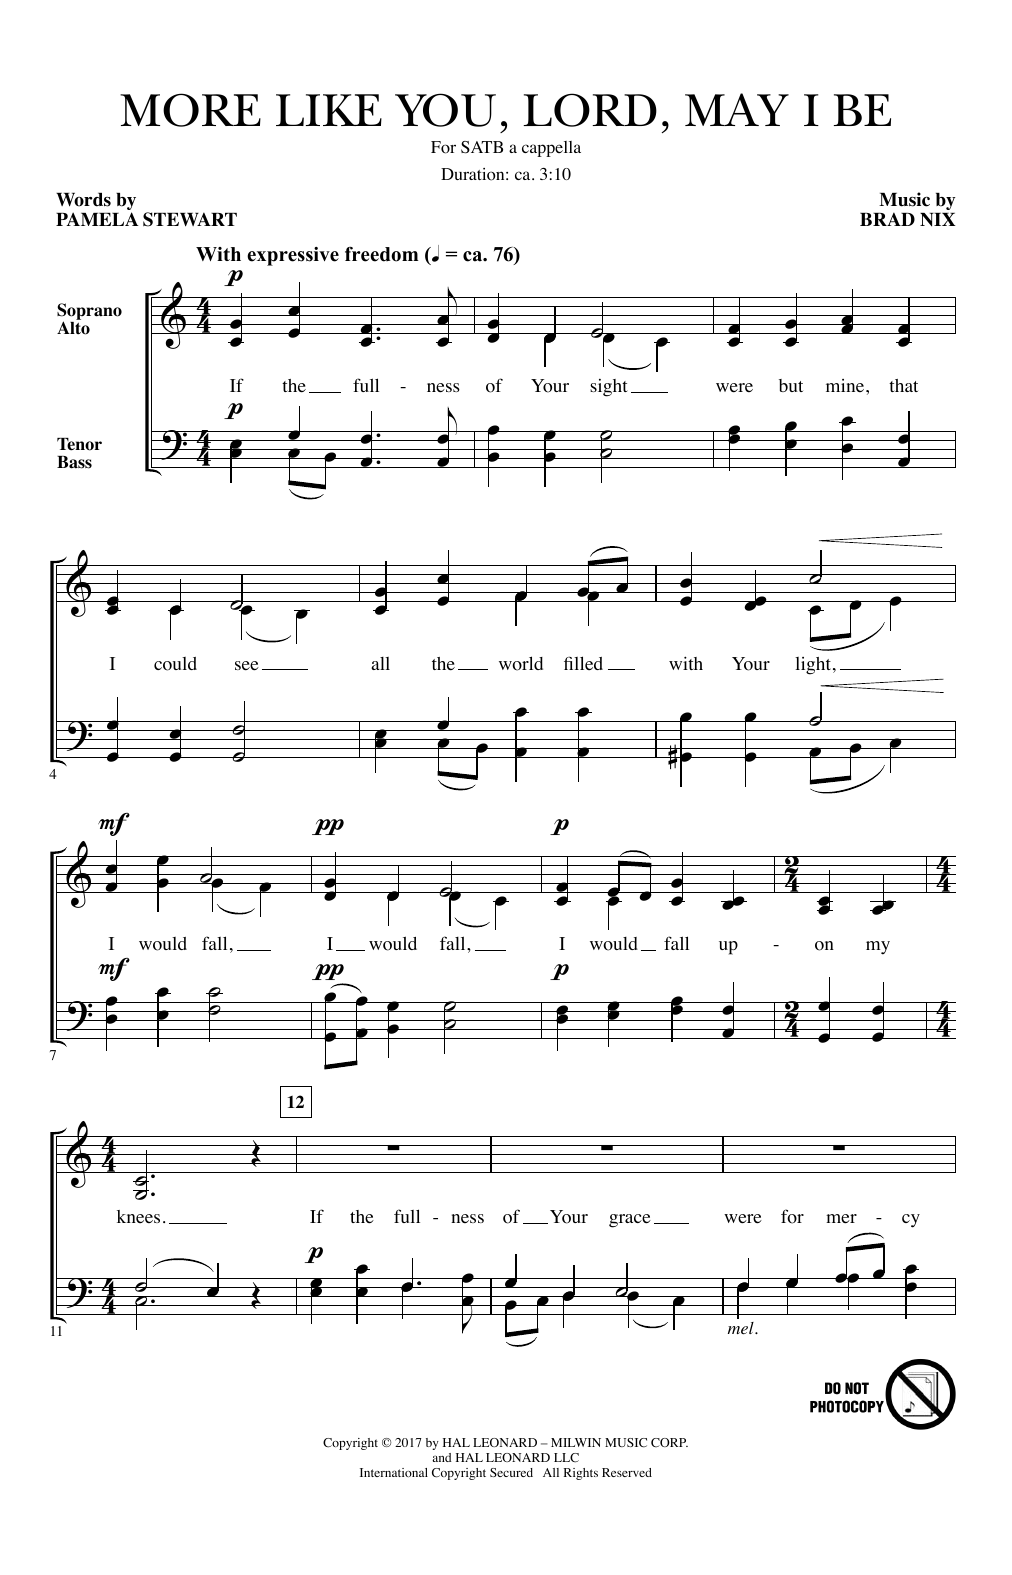 Brad Nix More Like You, Lord, May I Be sheet music notes and chords. Download Printable PDF.